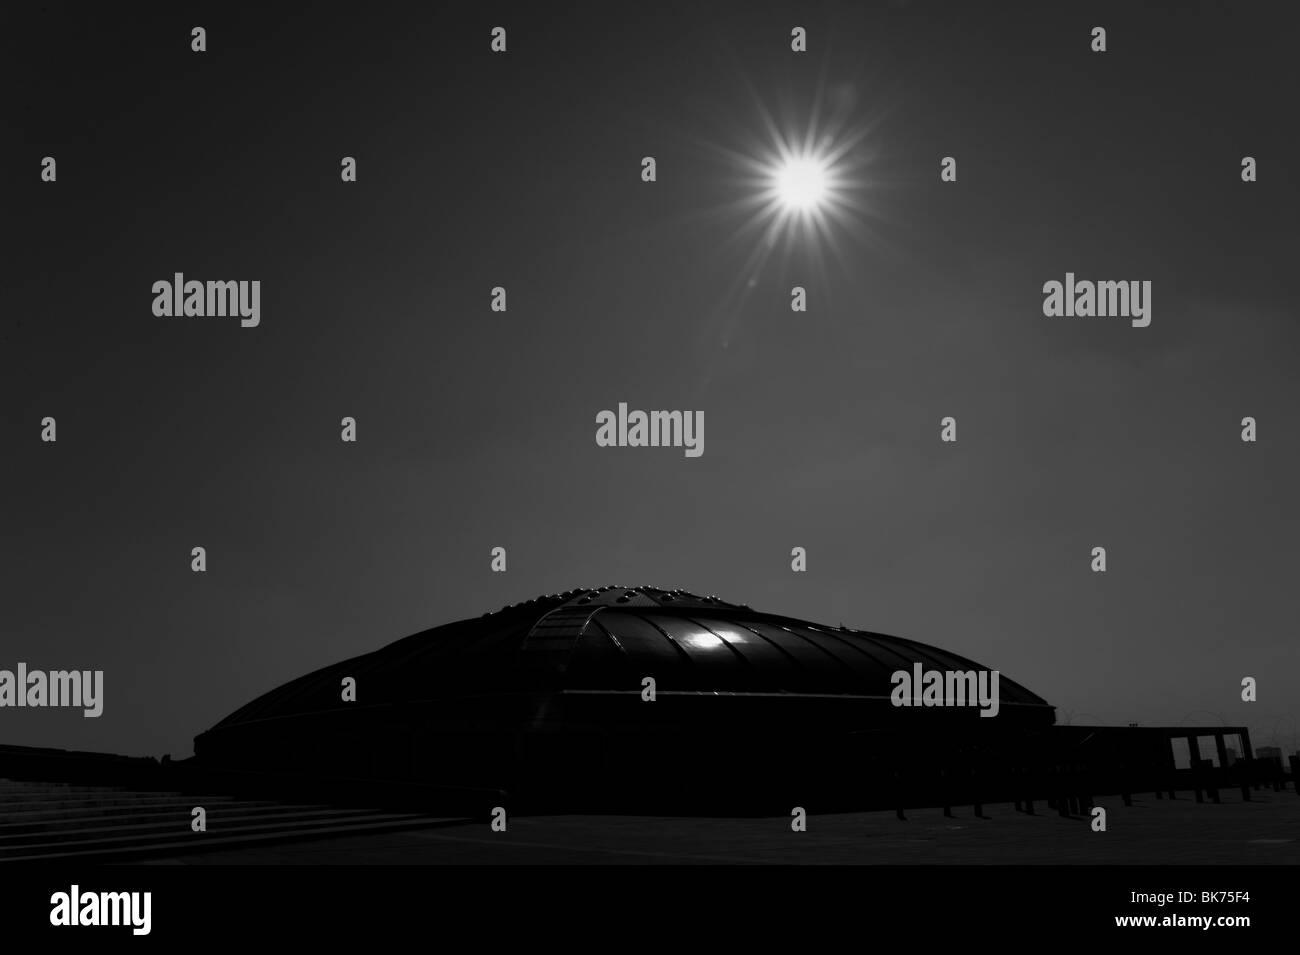 View of the Palau Sant Jordi Stadium in Montjuic, Barcelona, Spain. - Stock Image